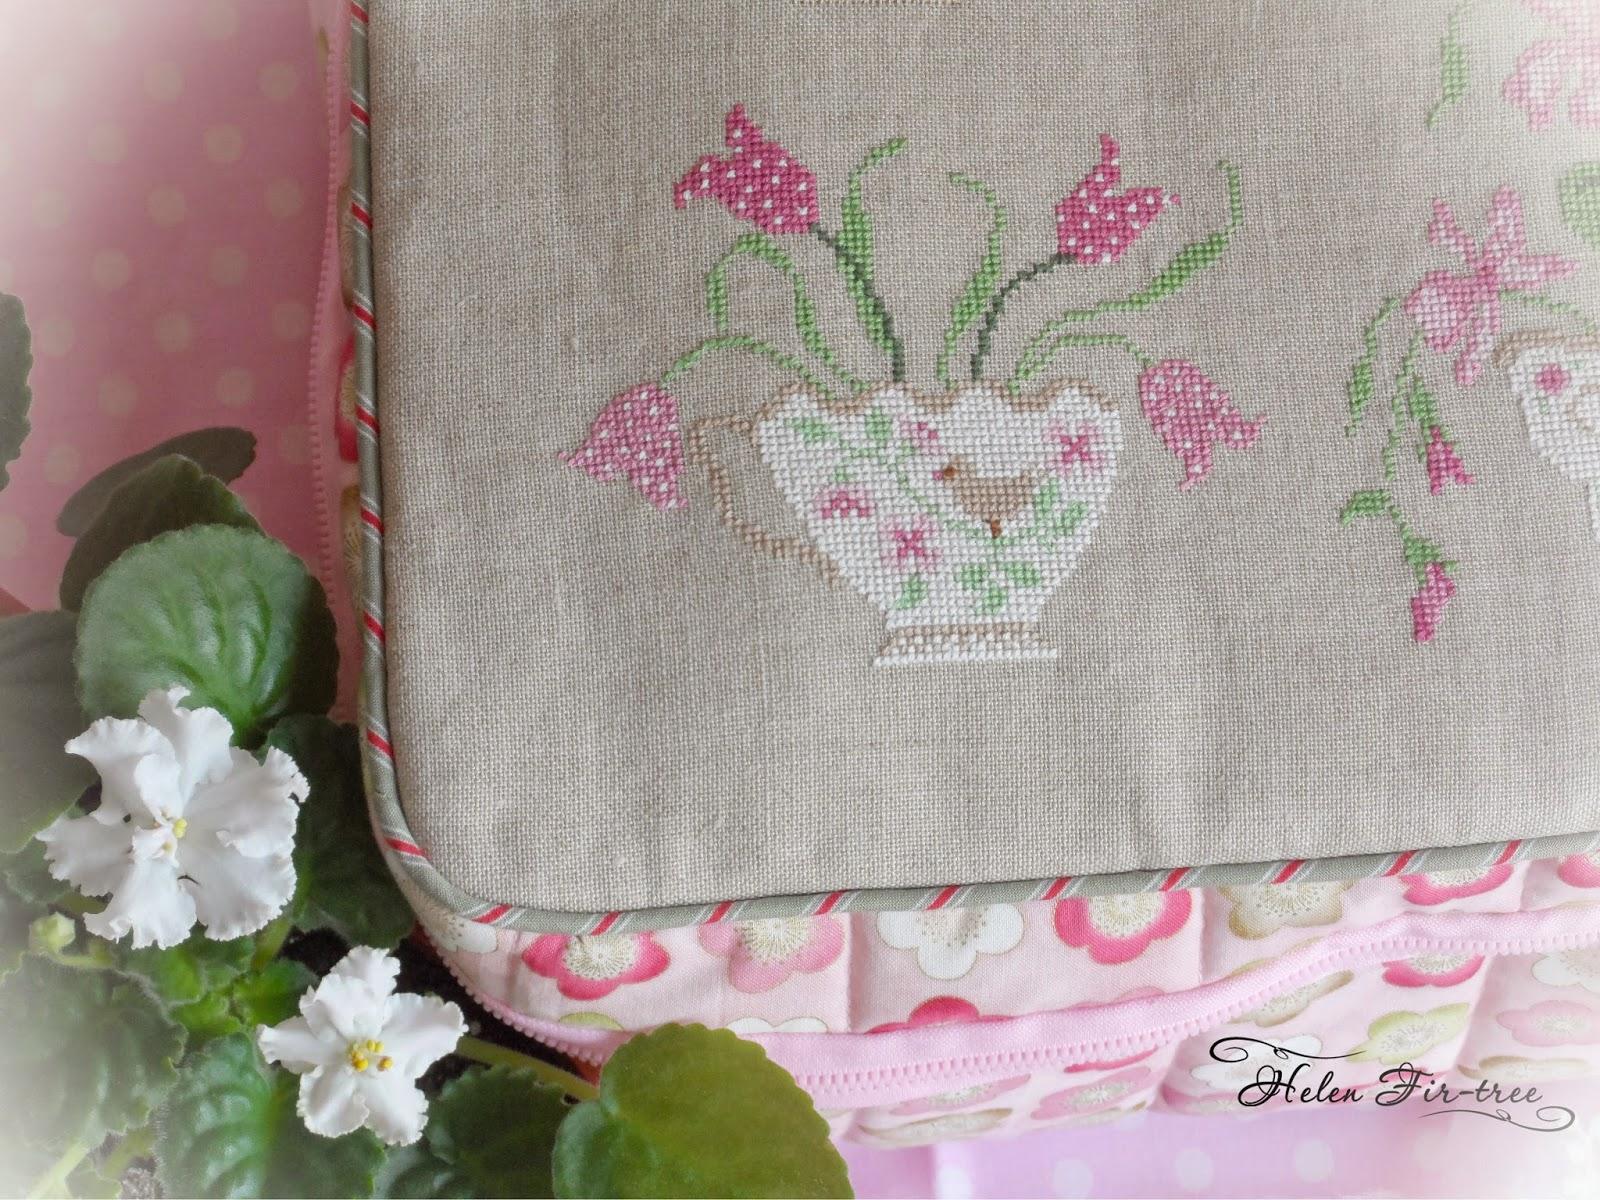 Helen Fir-tree вышивка крестом органайзер stitch organizer